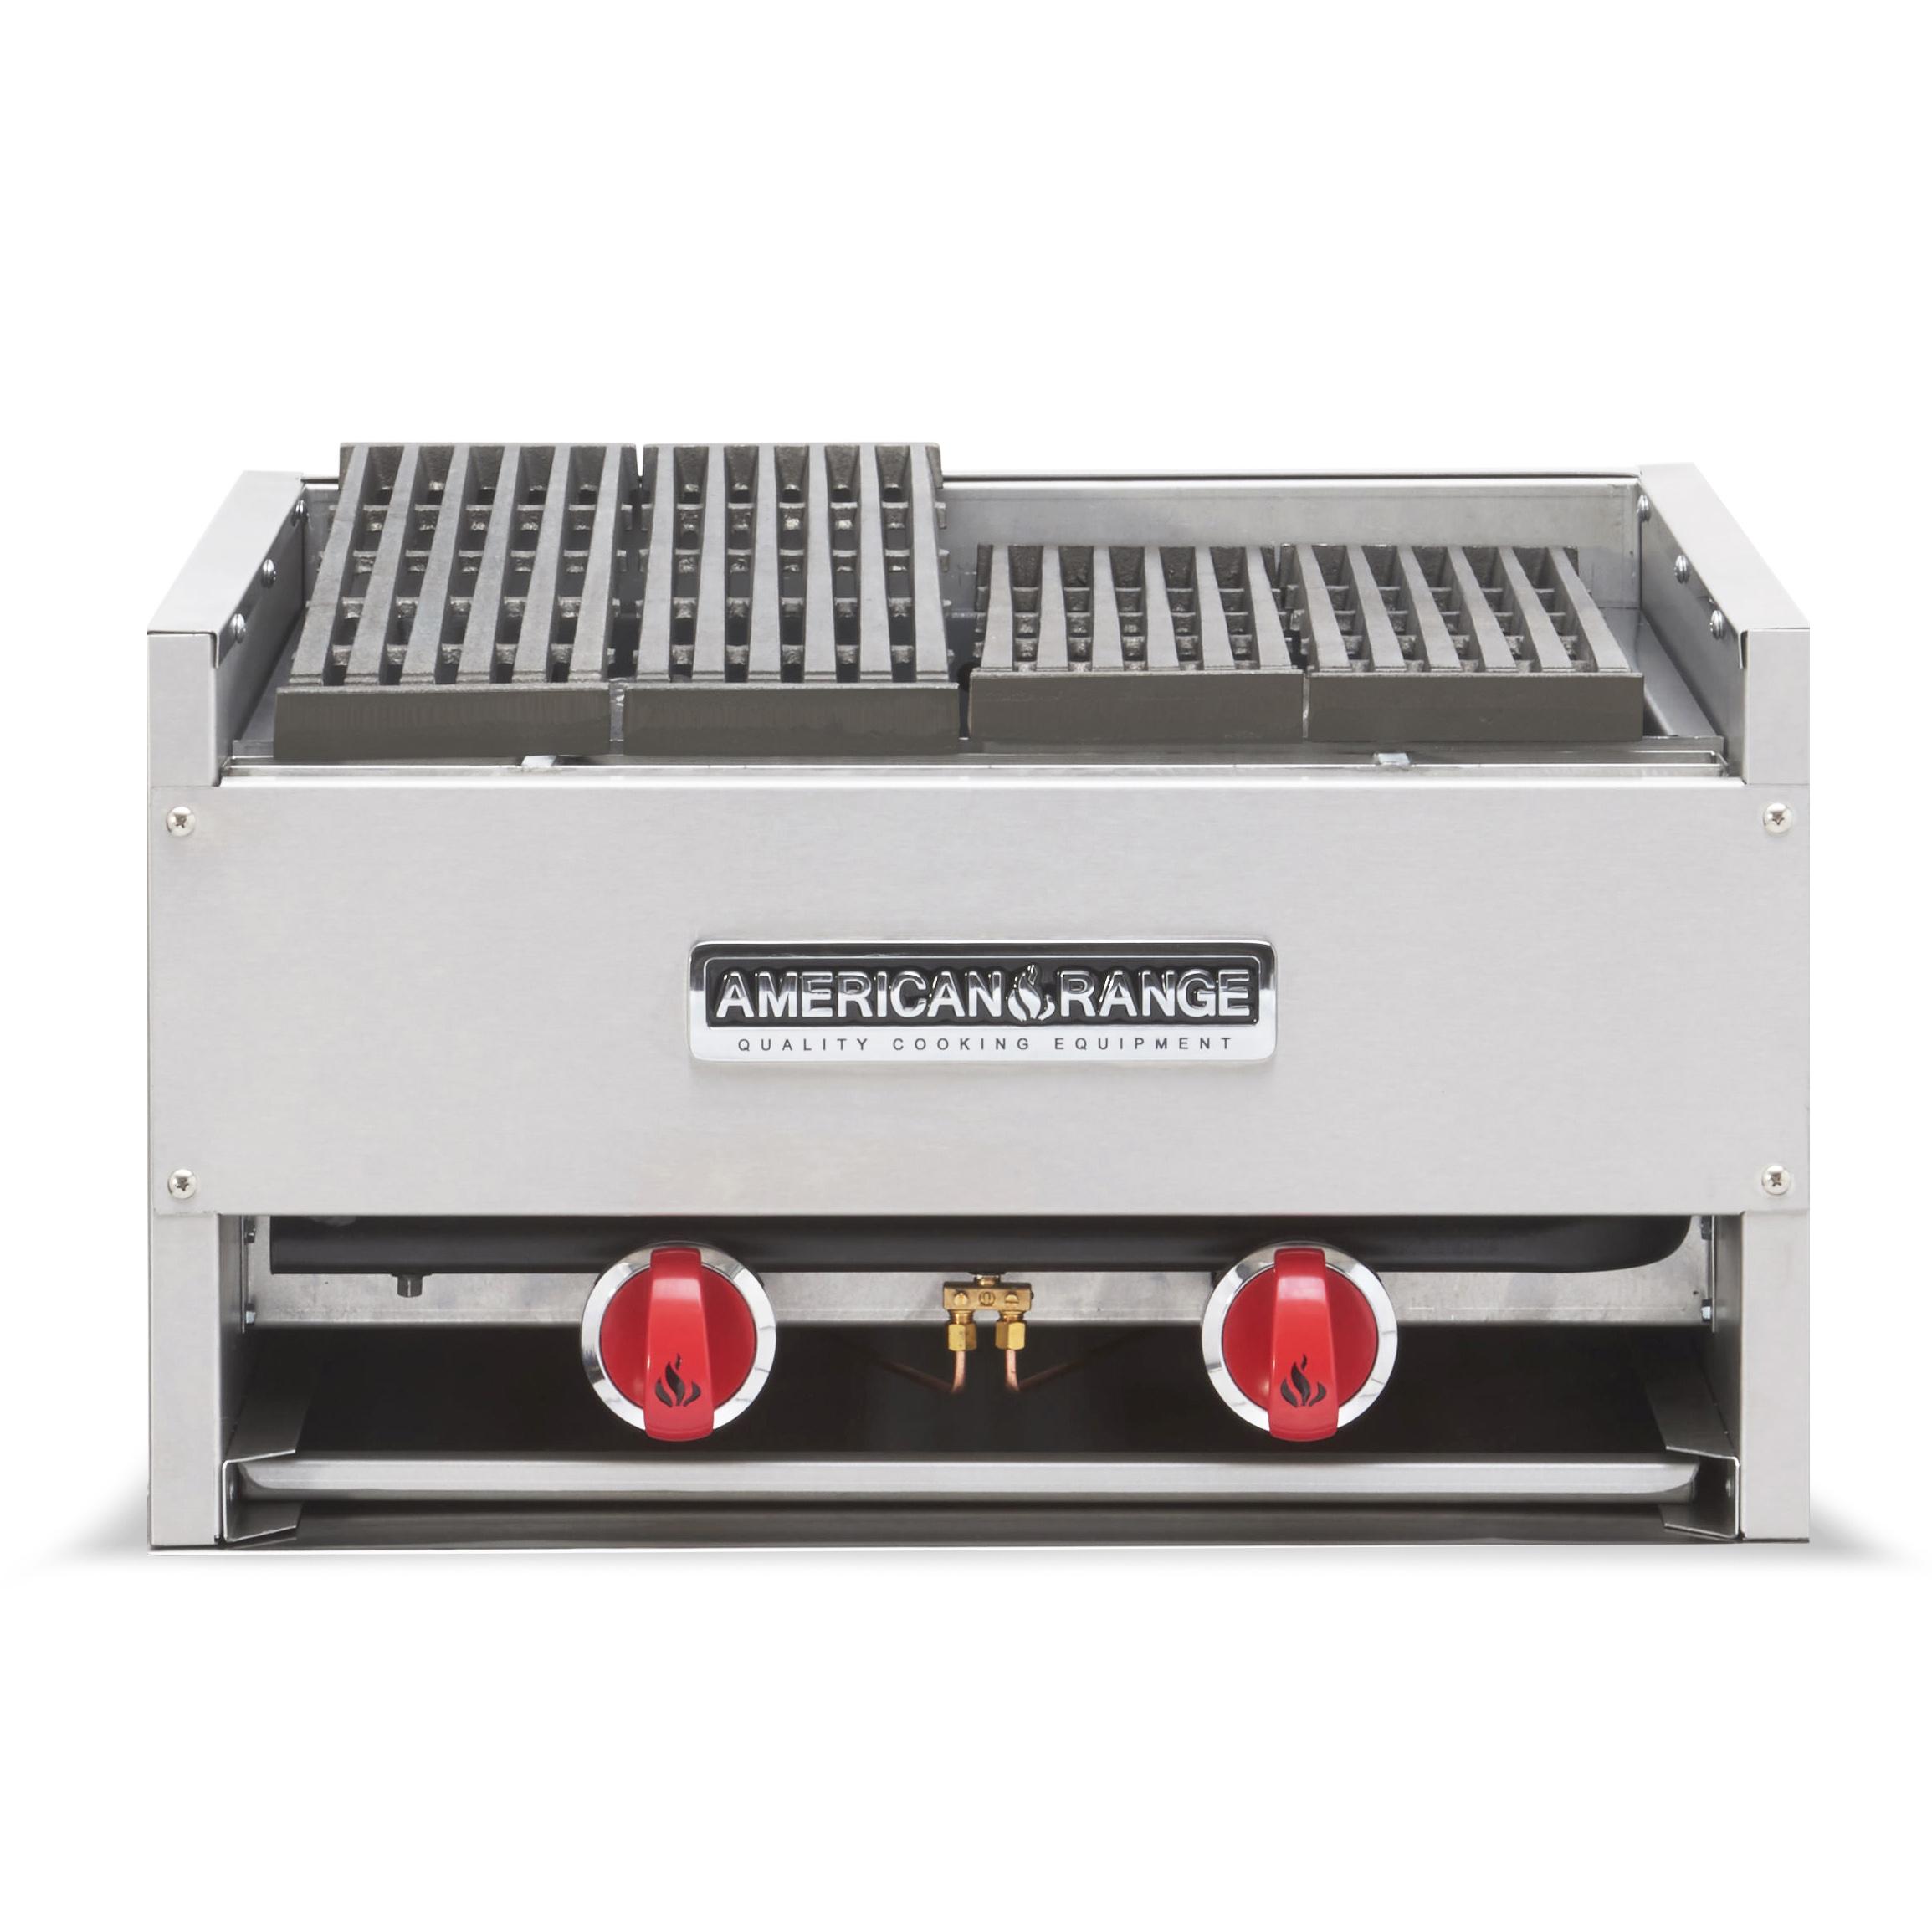 American Range AECB-14 charbroiler, gas, countertop